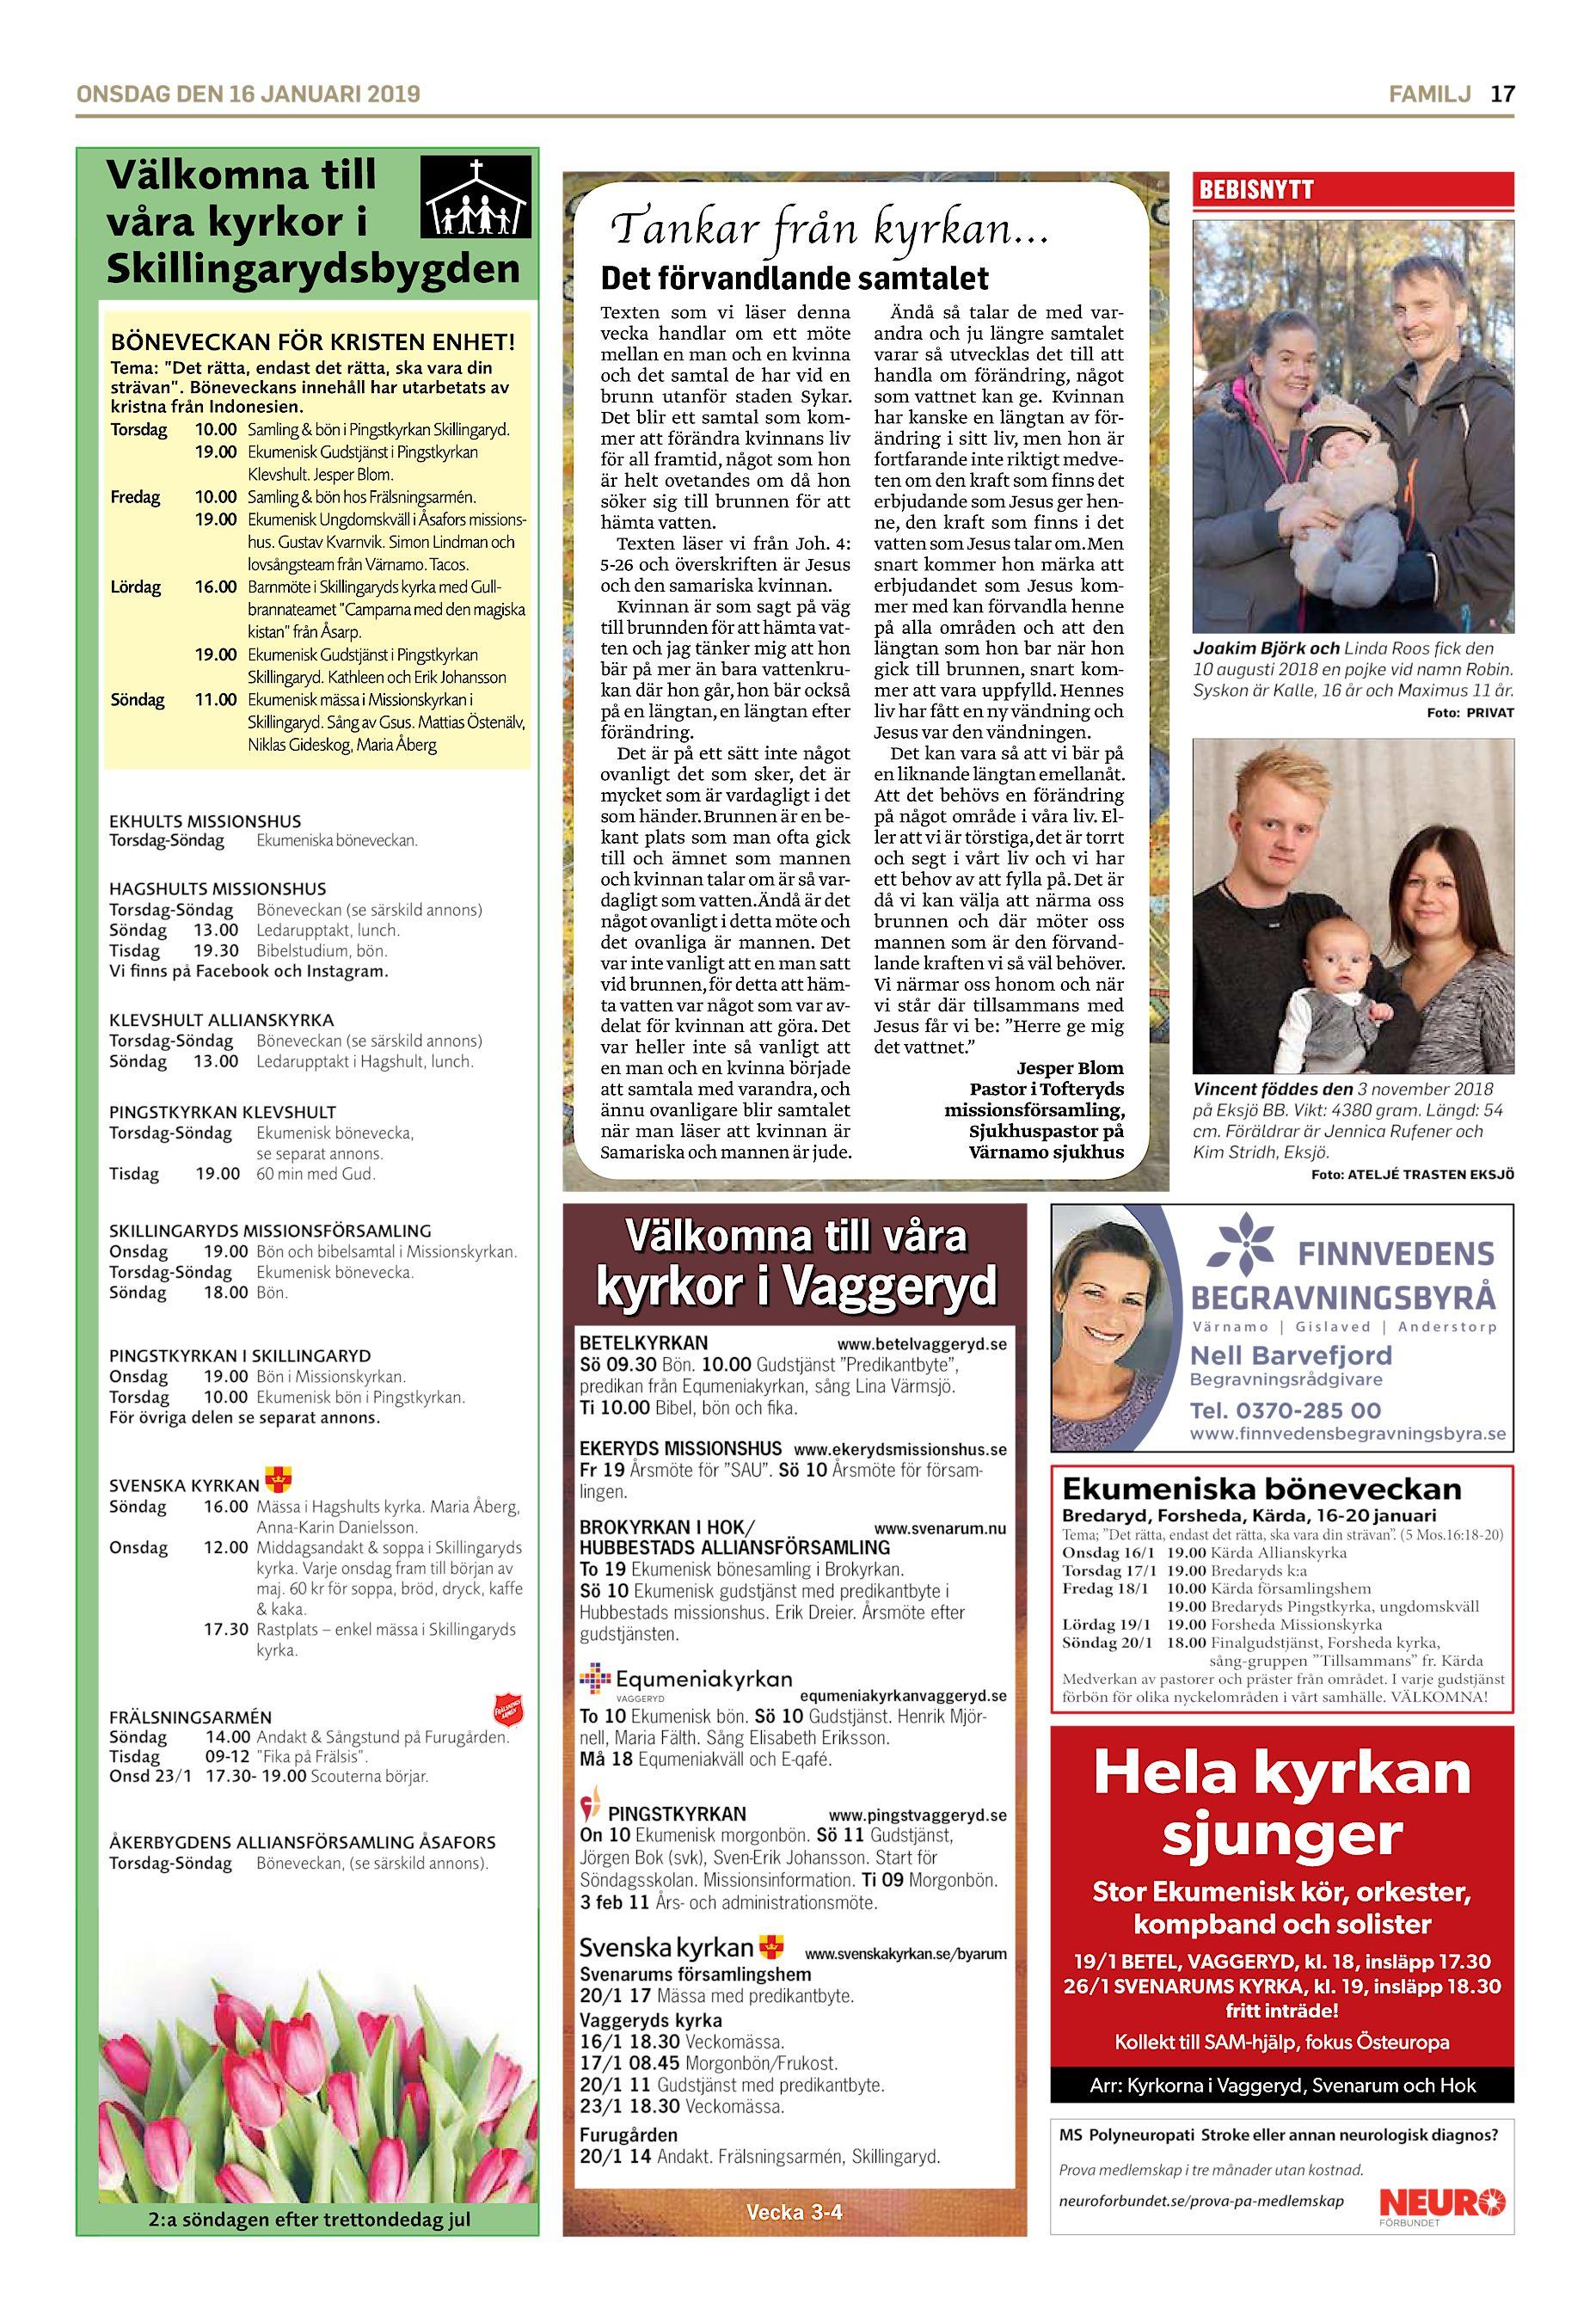 Elam Lindberg, Svenarum Rnnng 1, Hok | unam.net